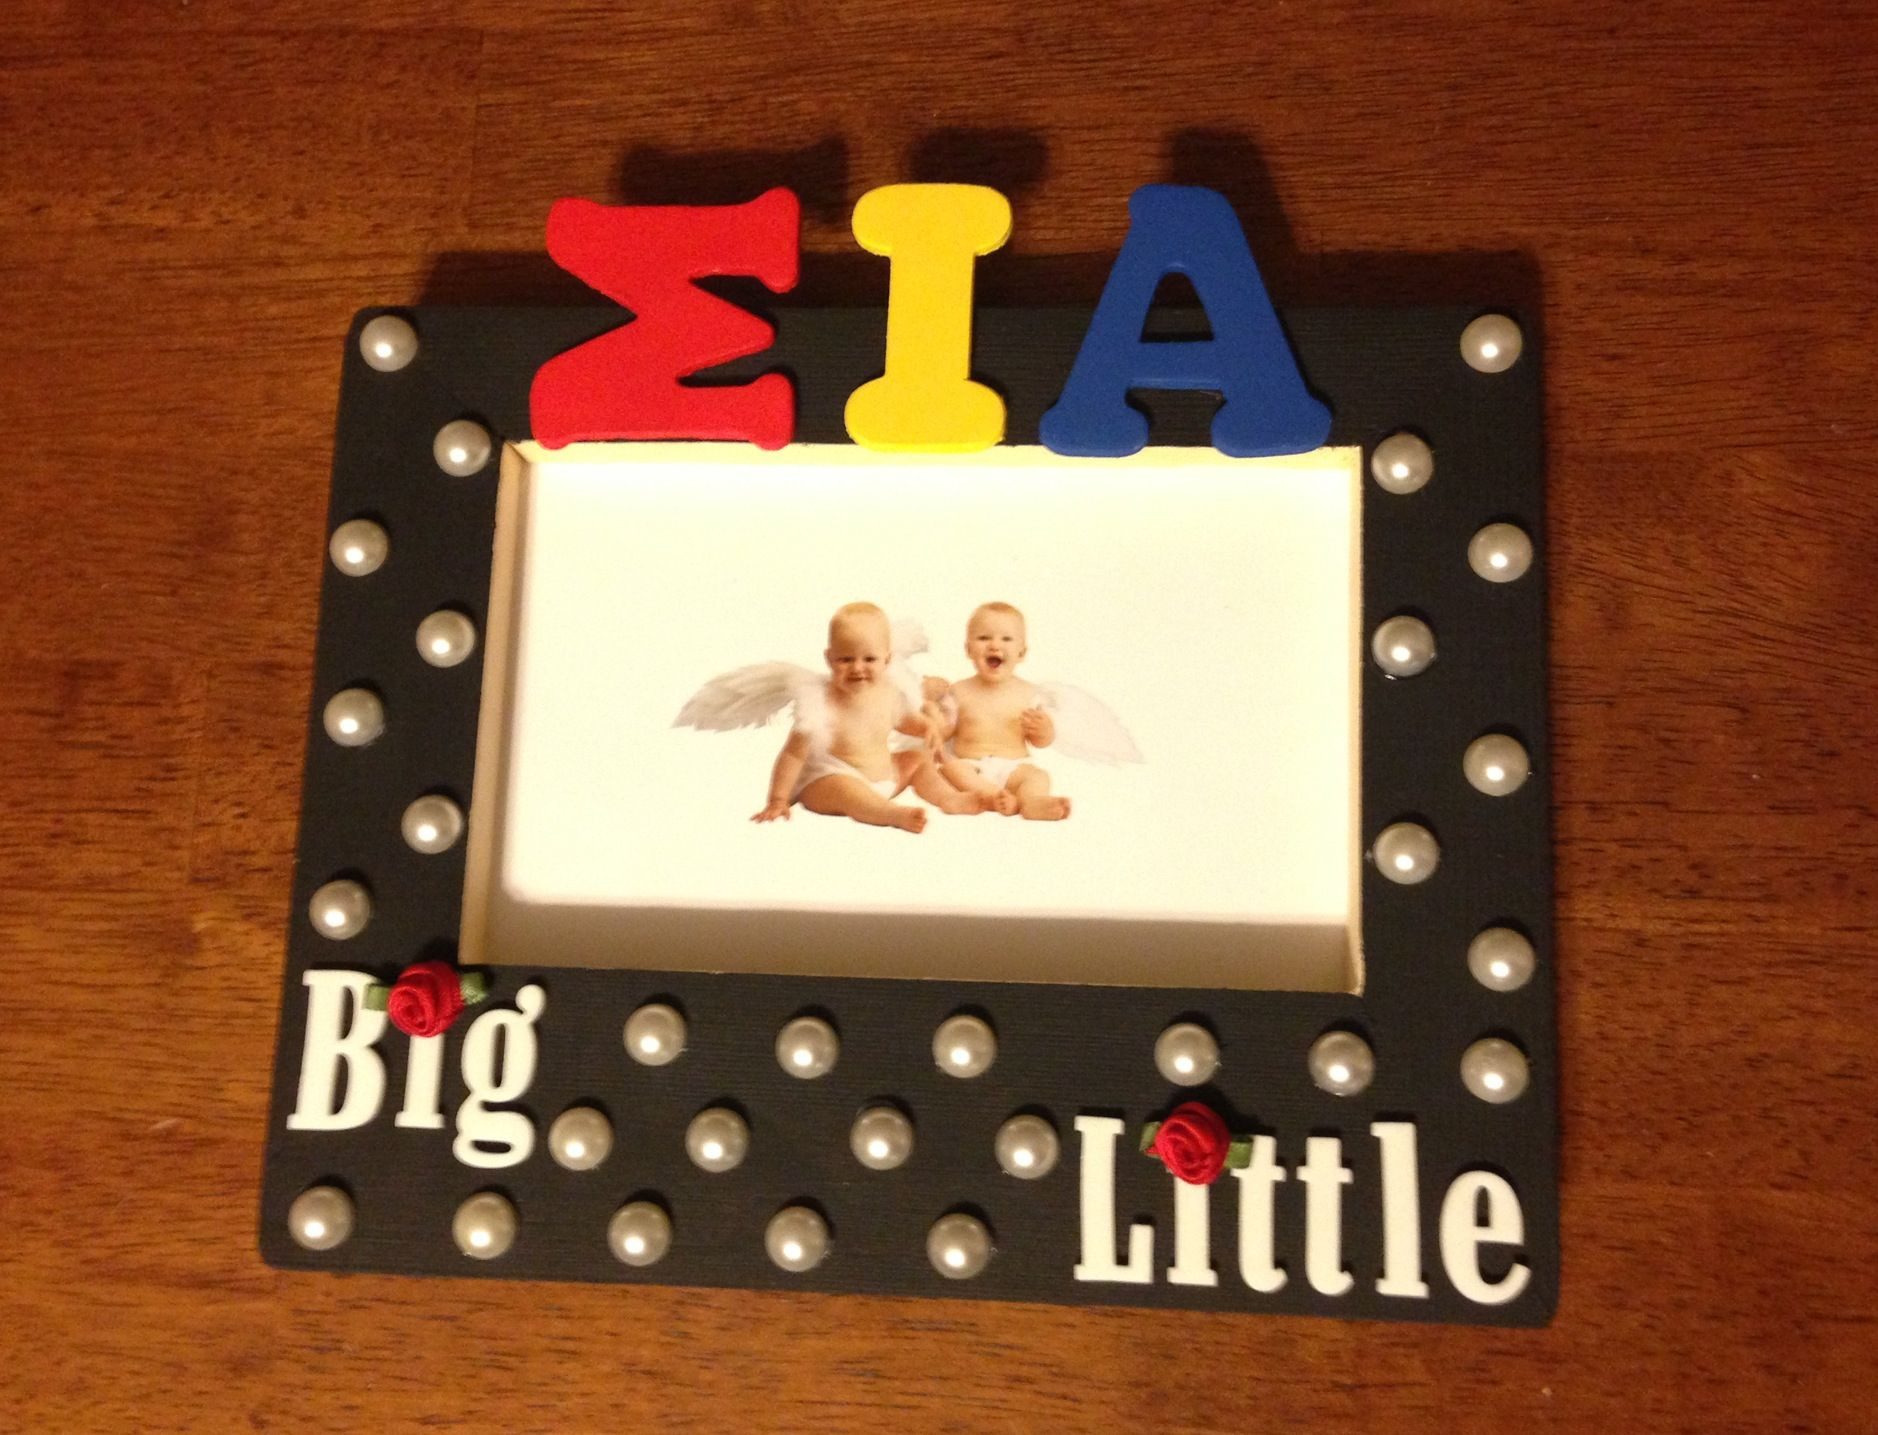 Sia big little picture frame greek pinterest sorority sia big little picture frame jeuxipadfo Images